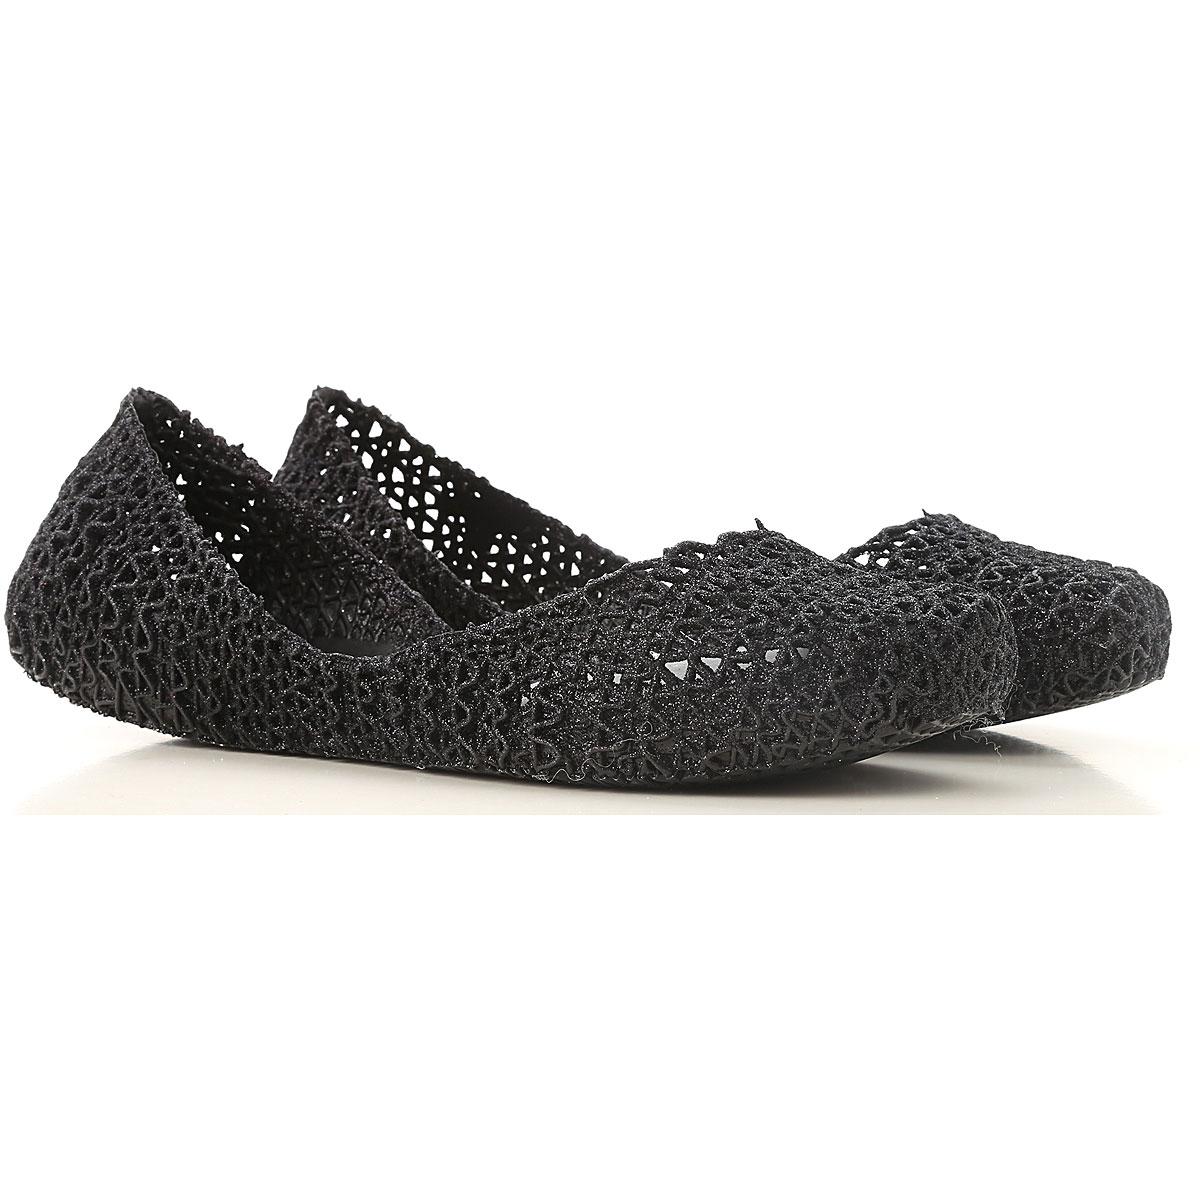 Melissa Ballet Flats Ballerina Shoes for Women On Sale, Melissa / Campana, Black, PVC, 2019, USA 5 - EUR 35/36 US 9 (EU 39) USA 6 - EUR 37 USA 7 - EUR